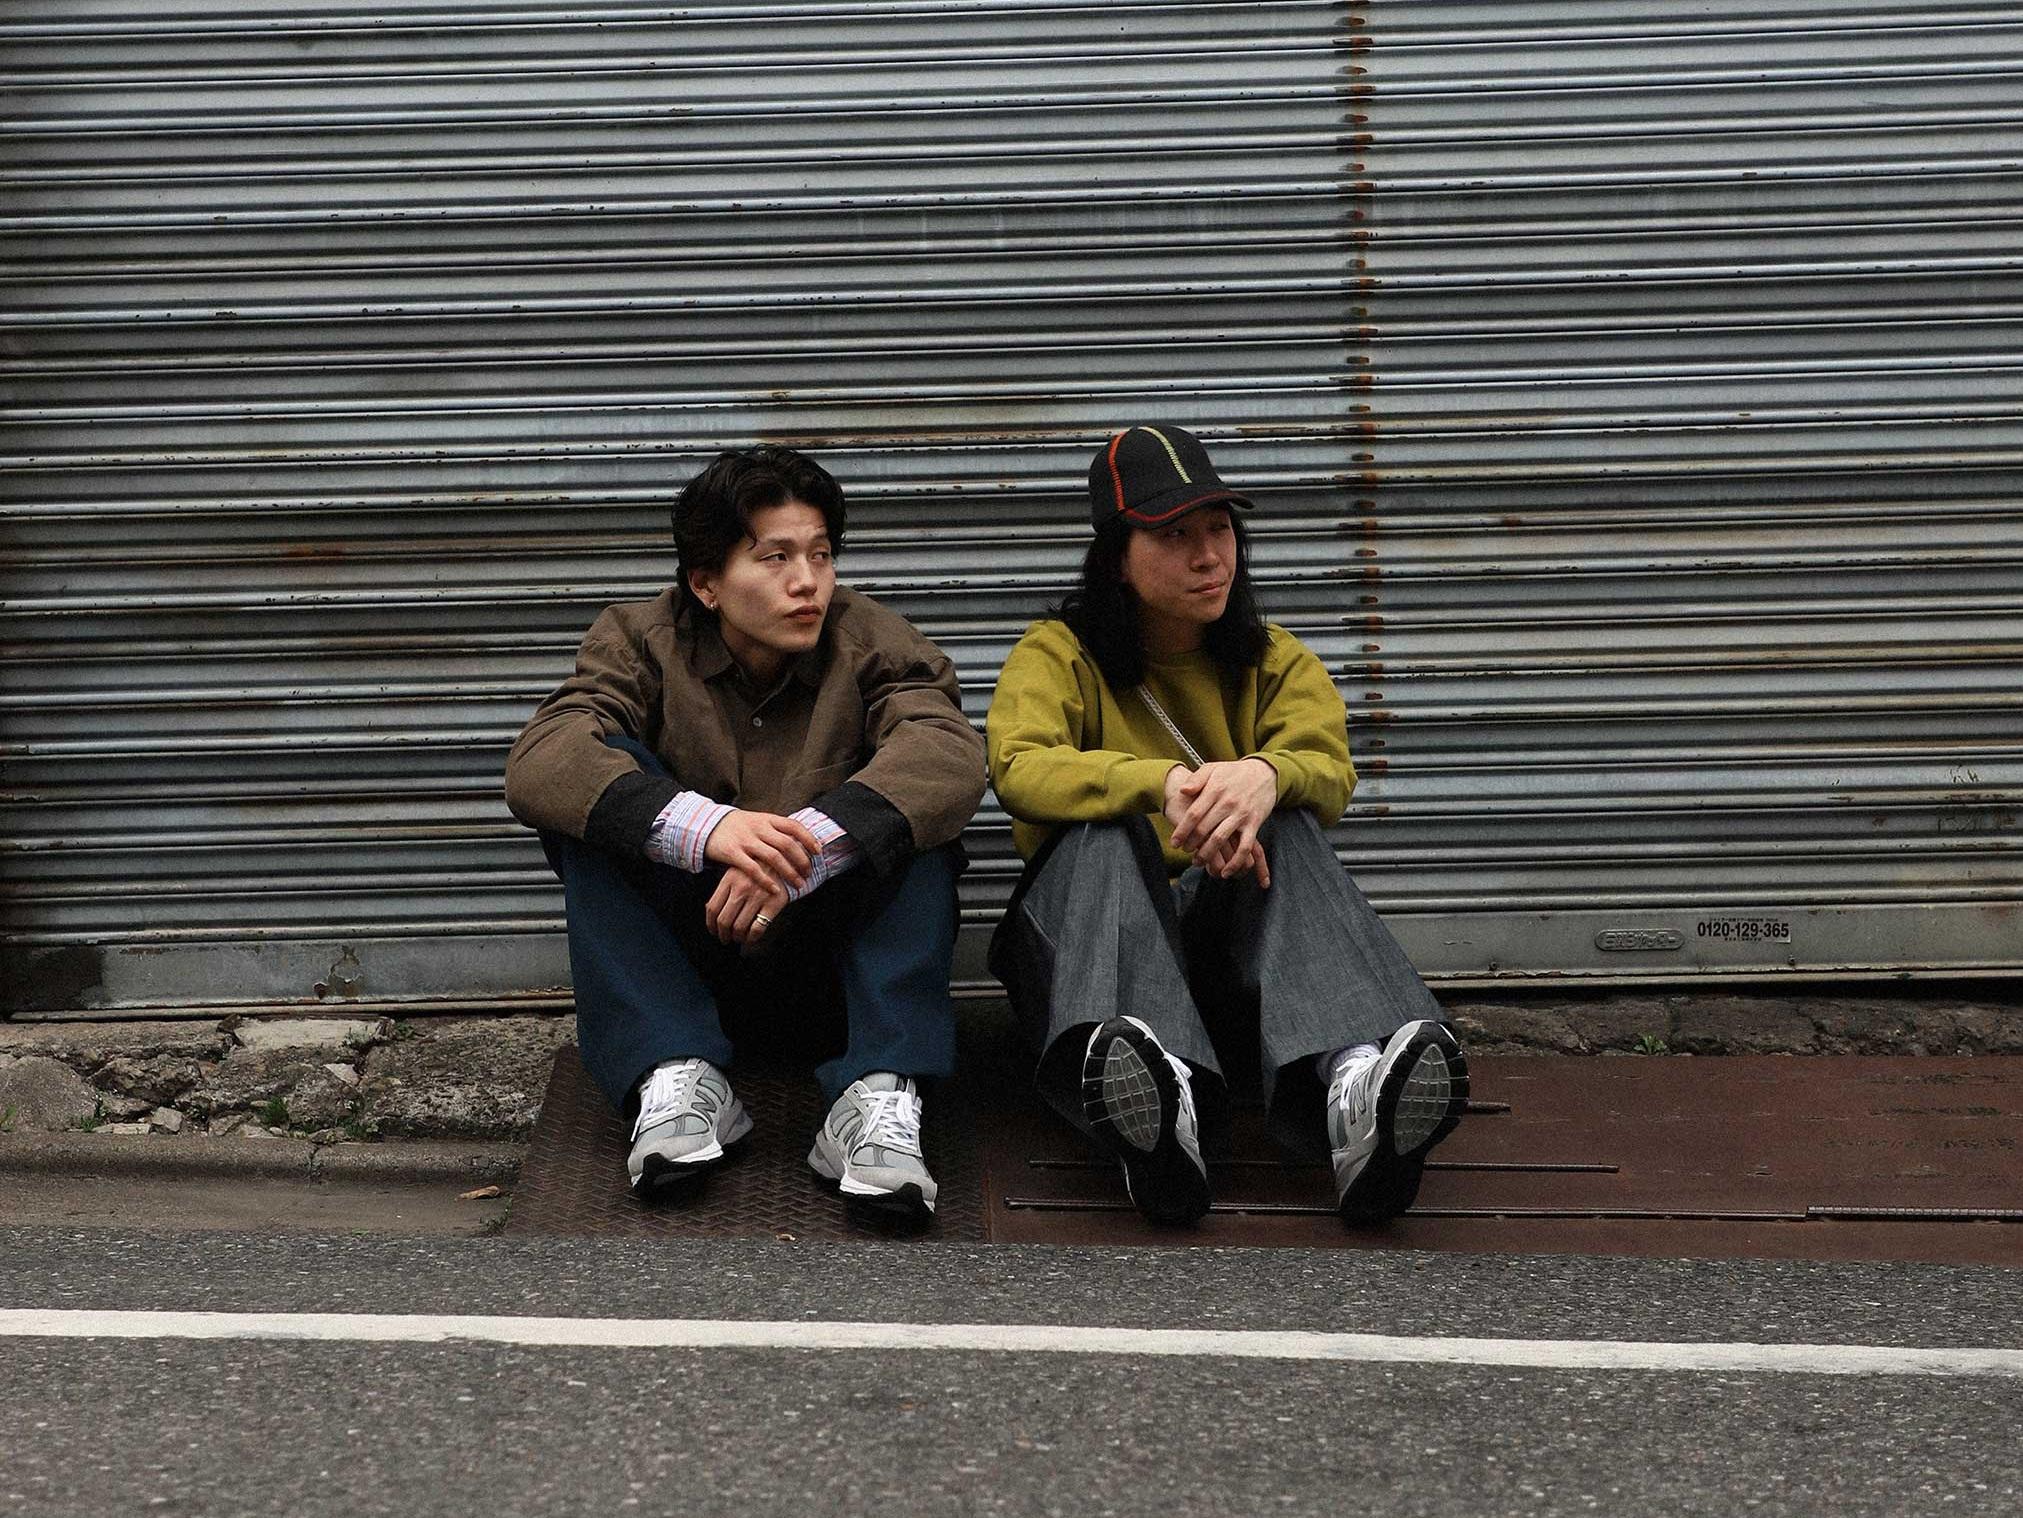 Tokyo 990V5 - A Sabukaru/AFEW Editorial